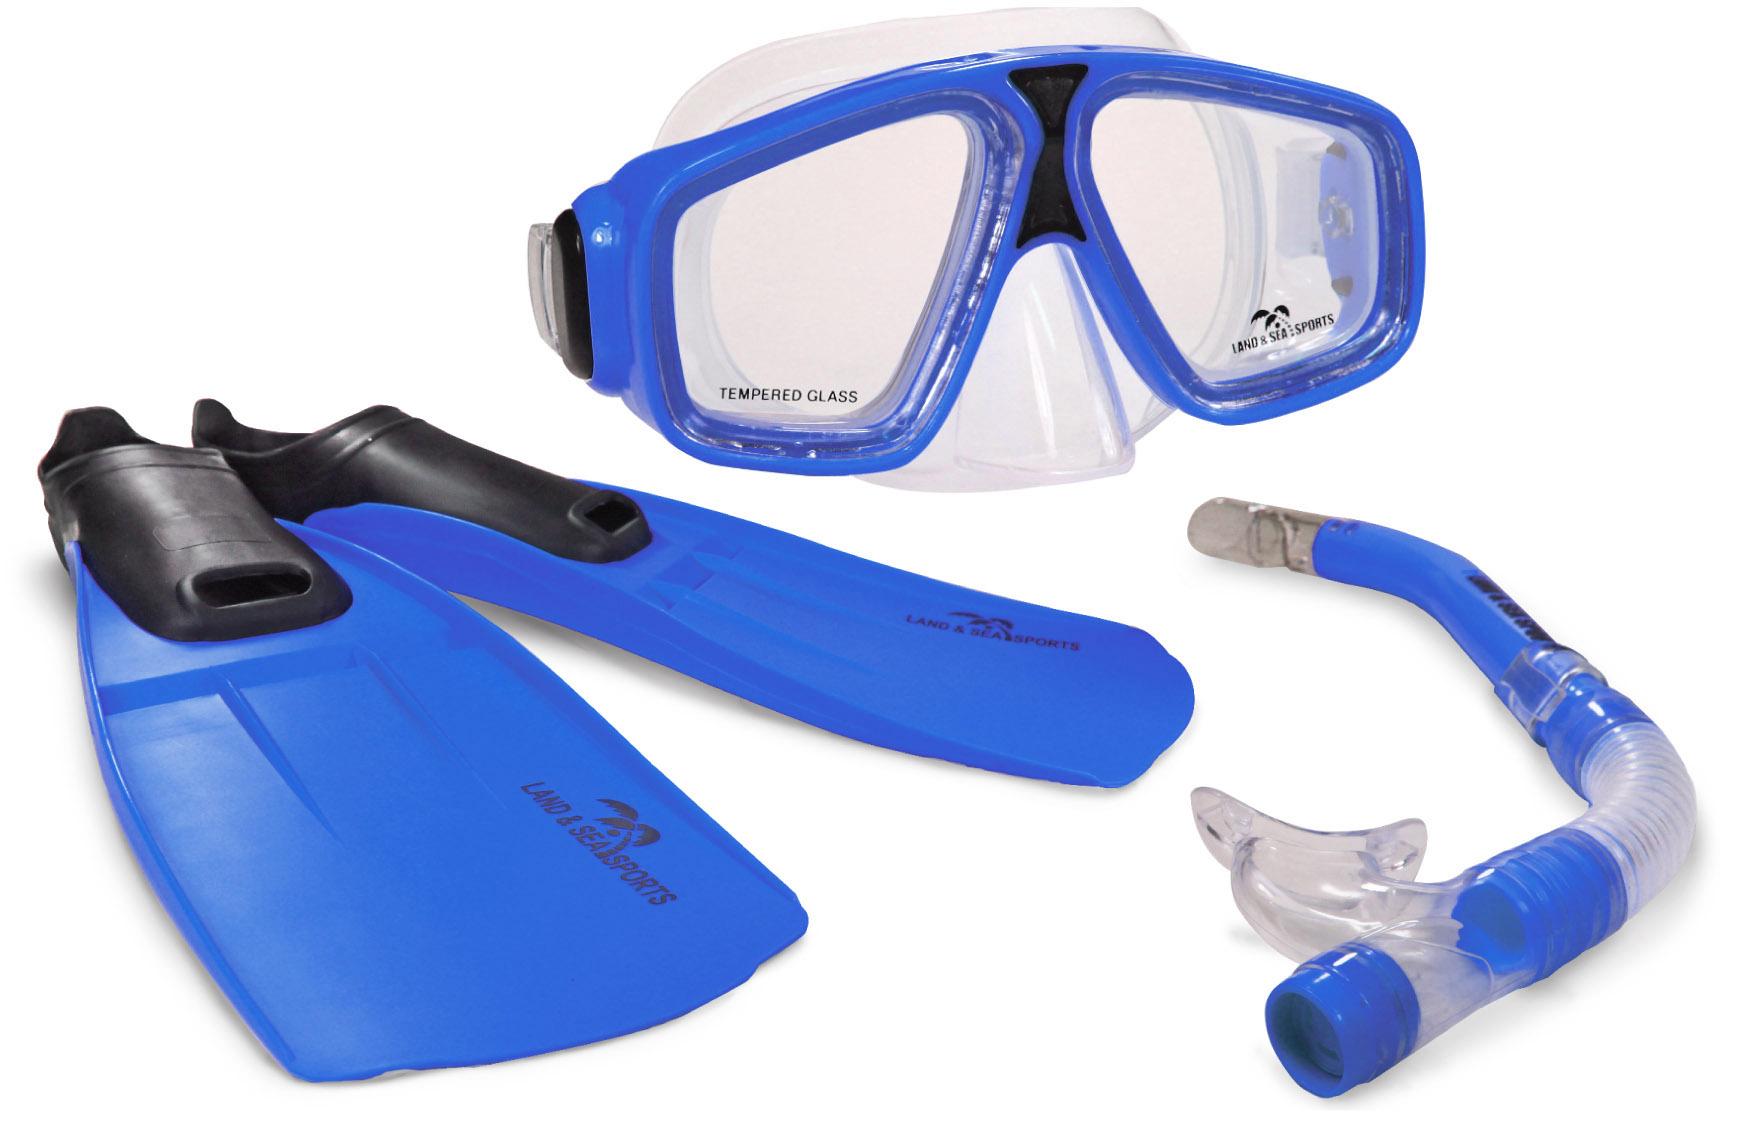 Adventurer Complete Snorkel Set